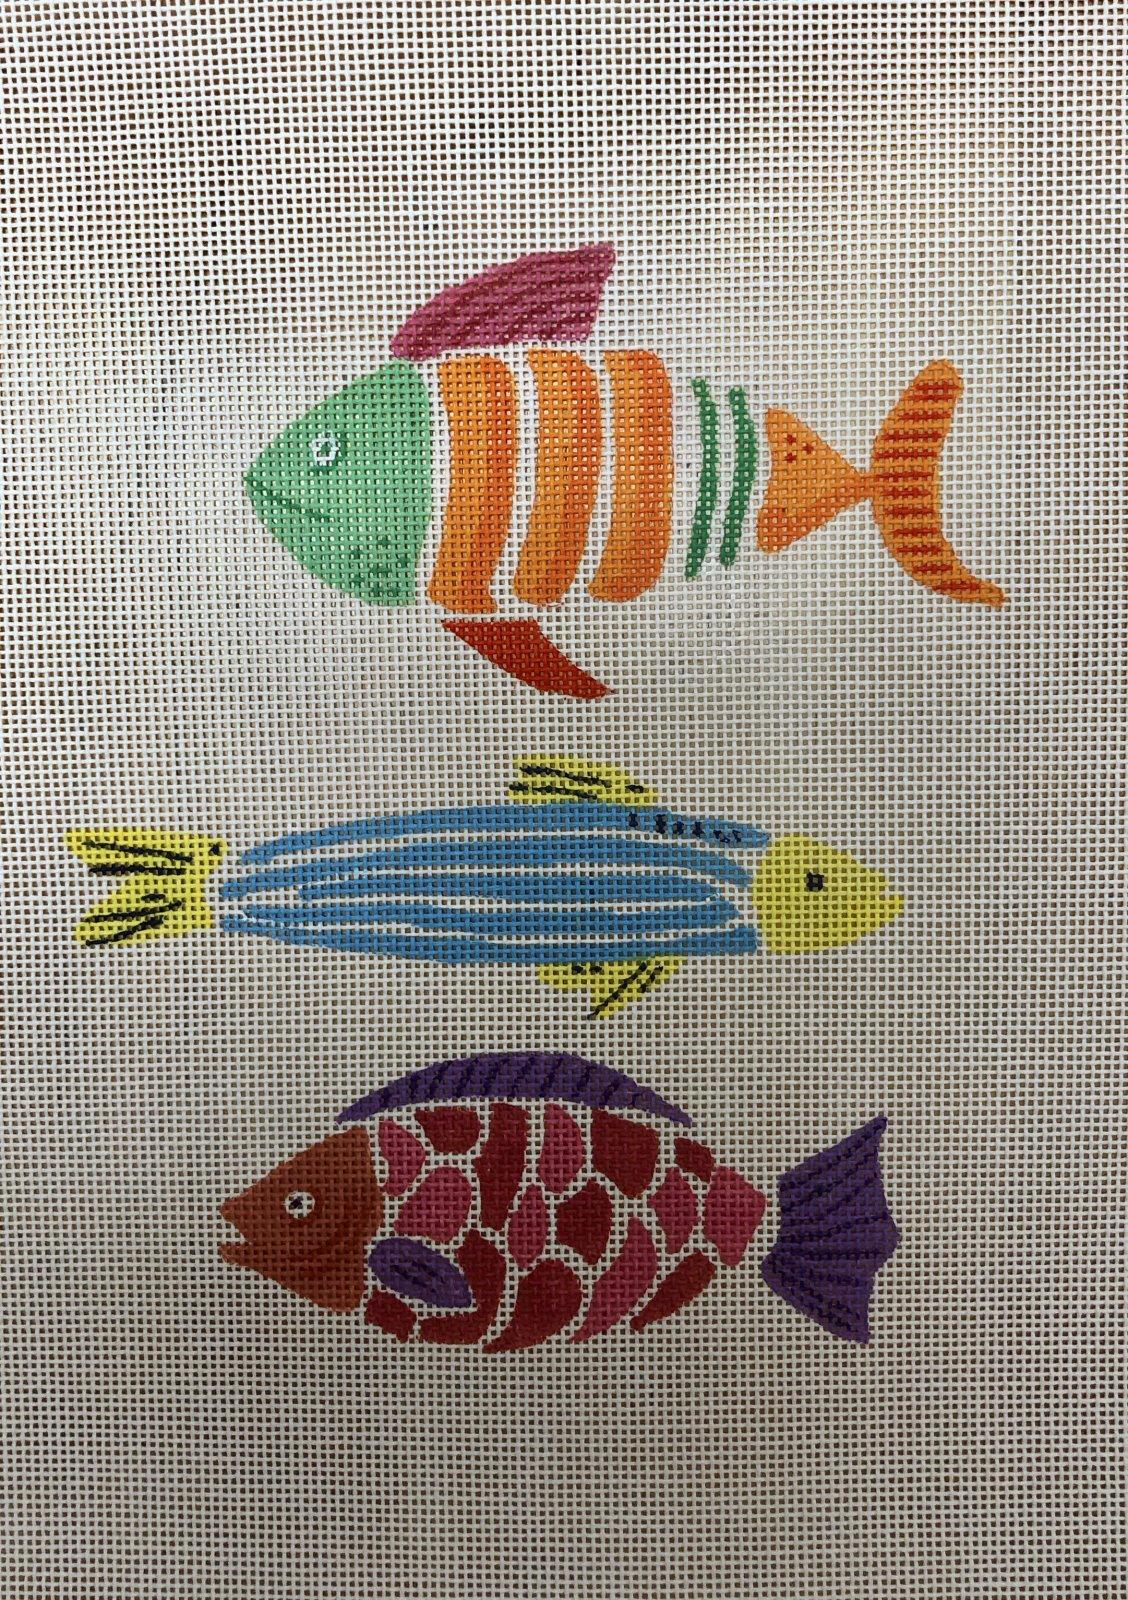 3 colorful fish